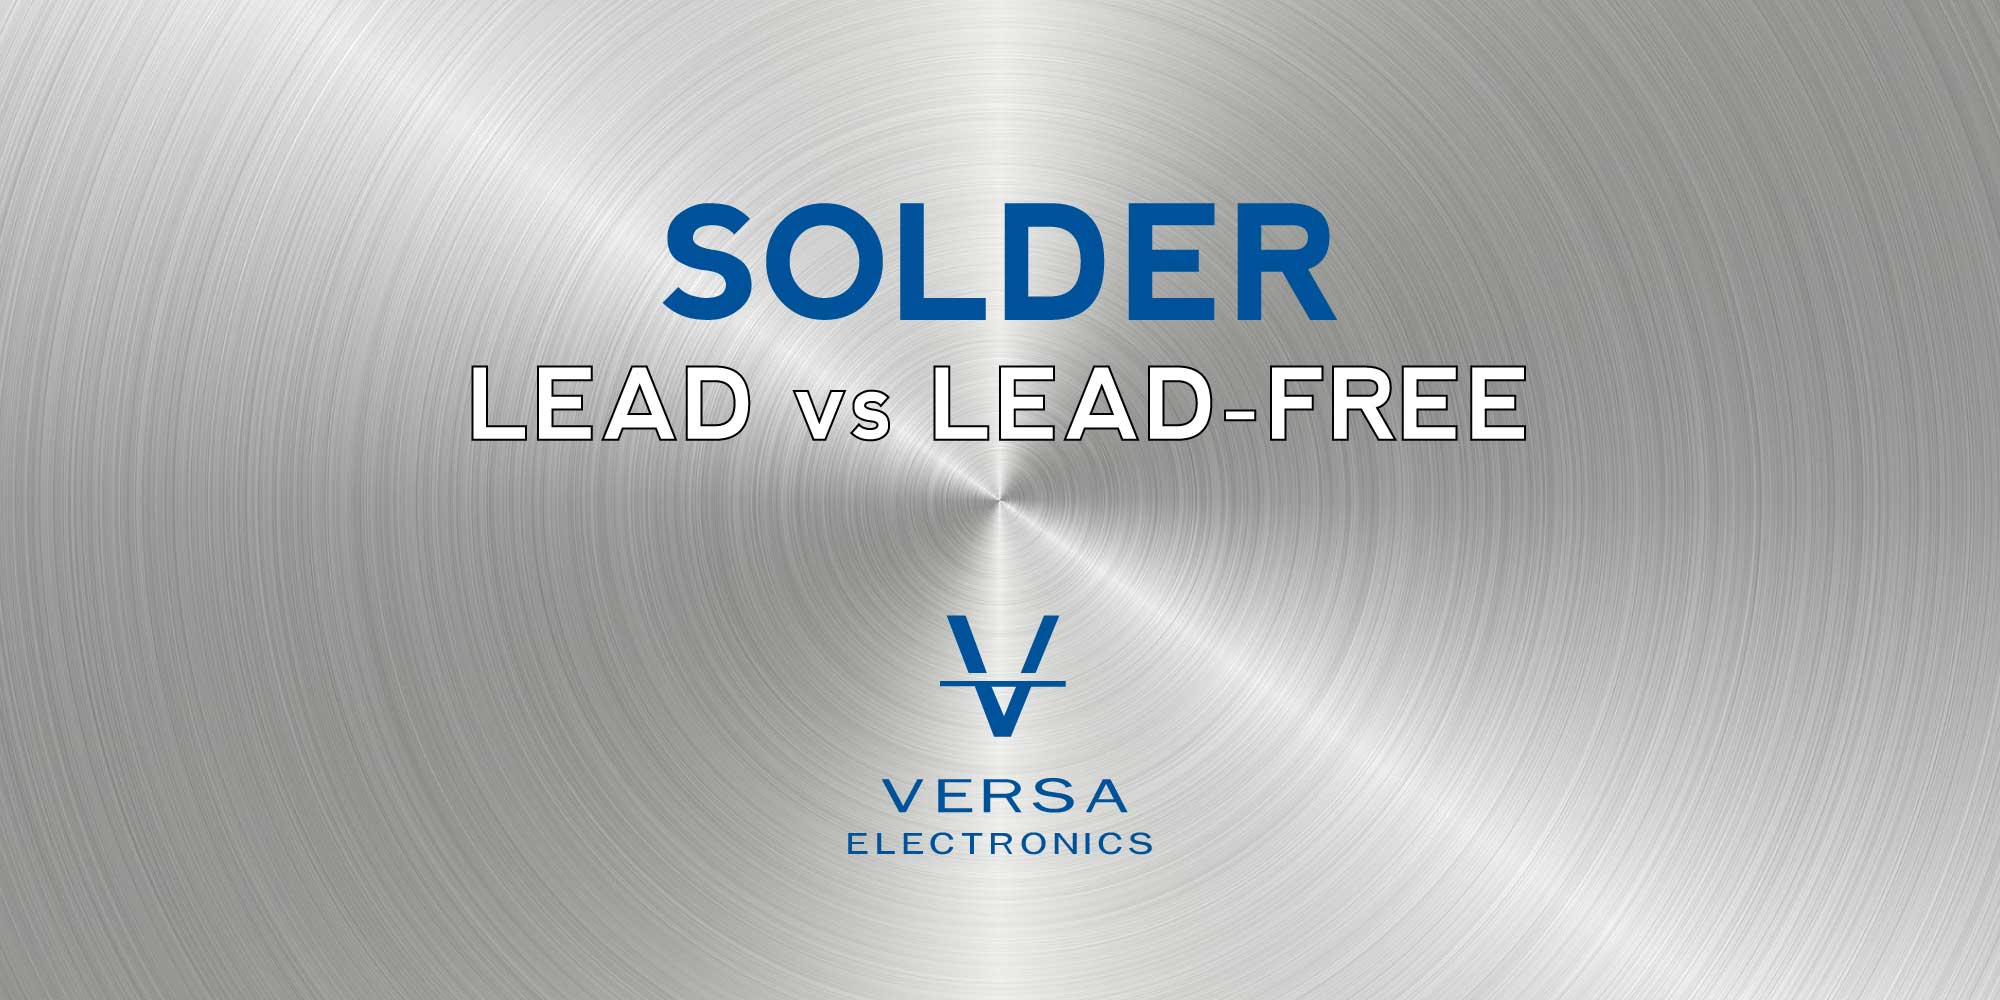 Lead vs Lead-Free Solder